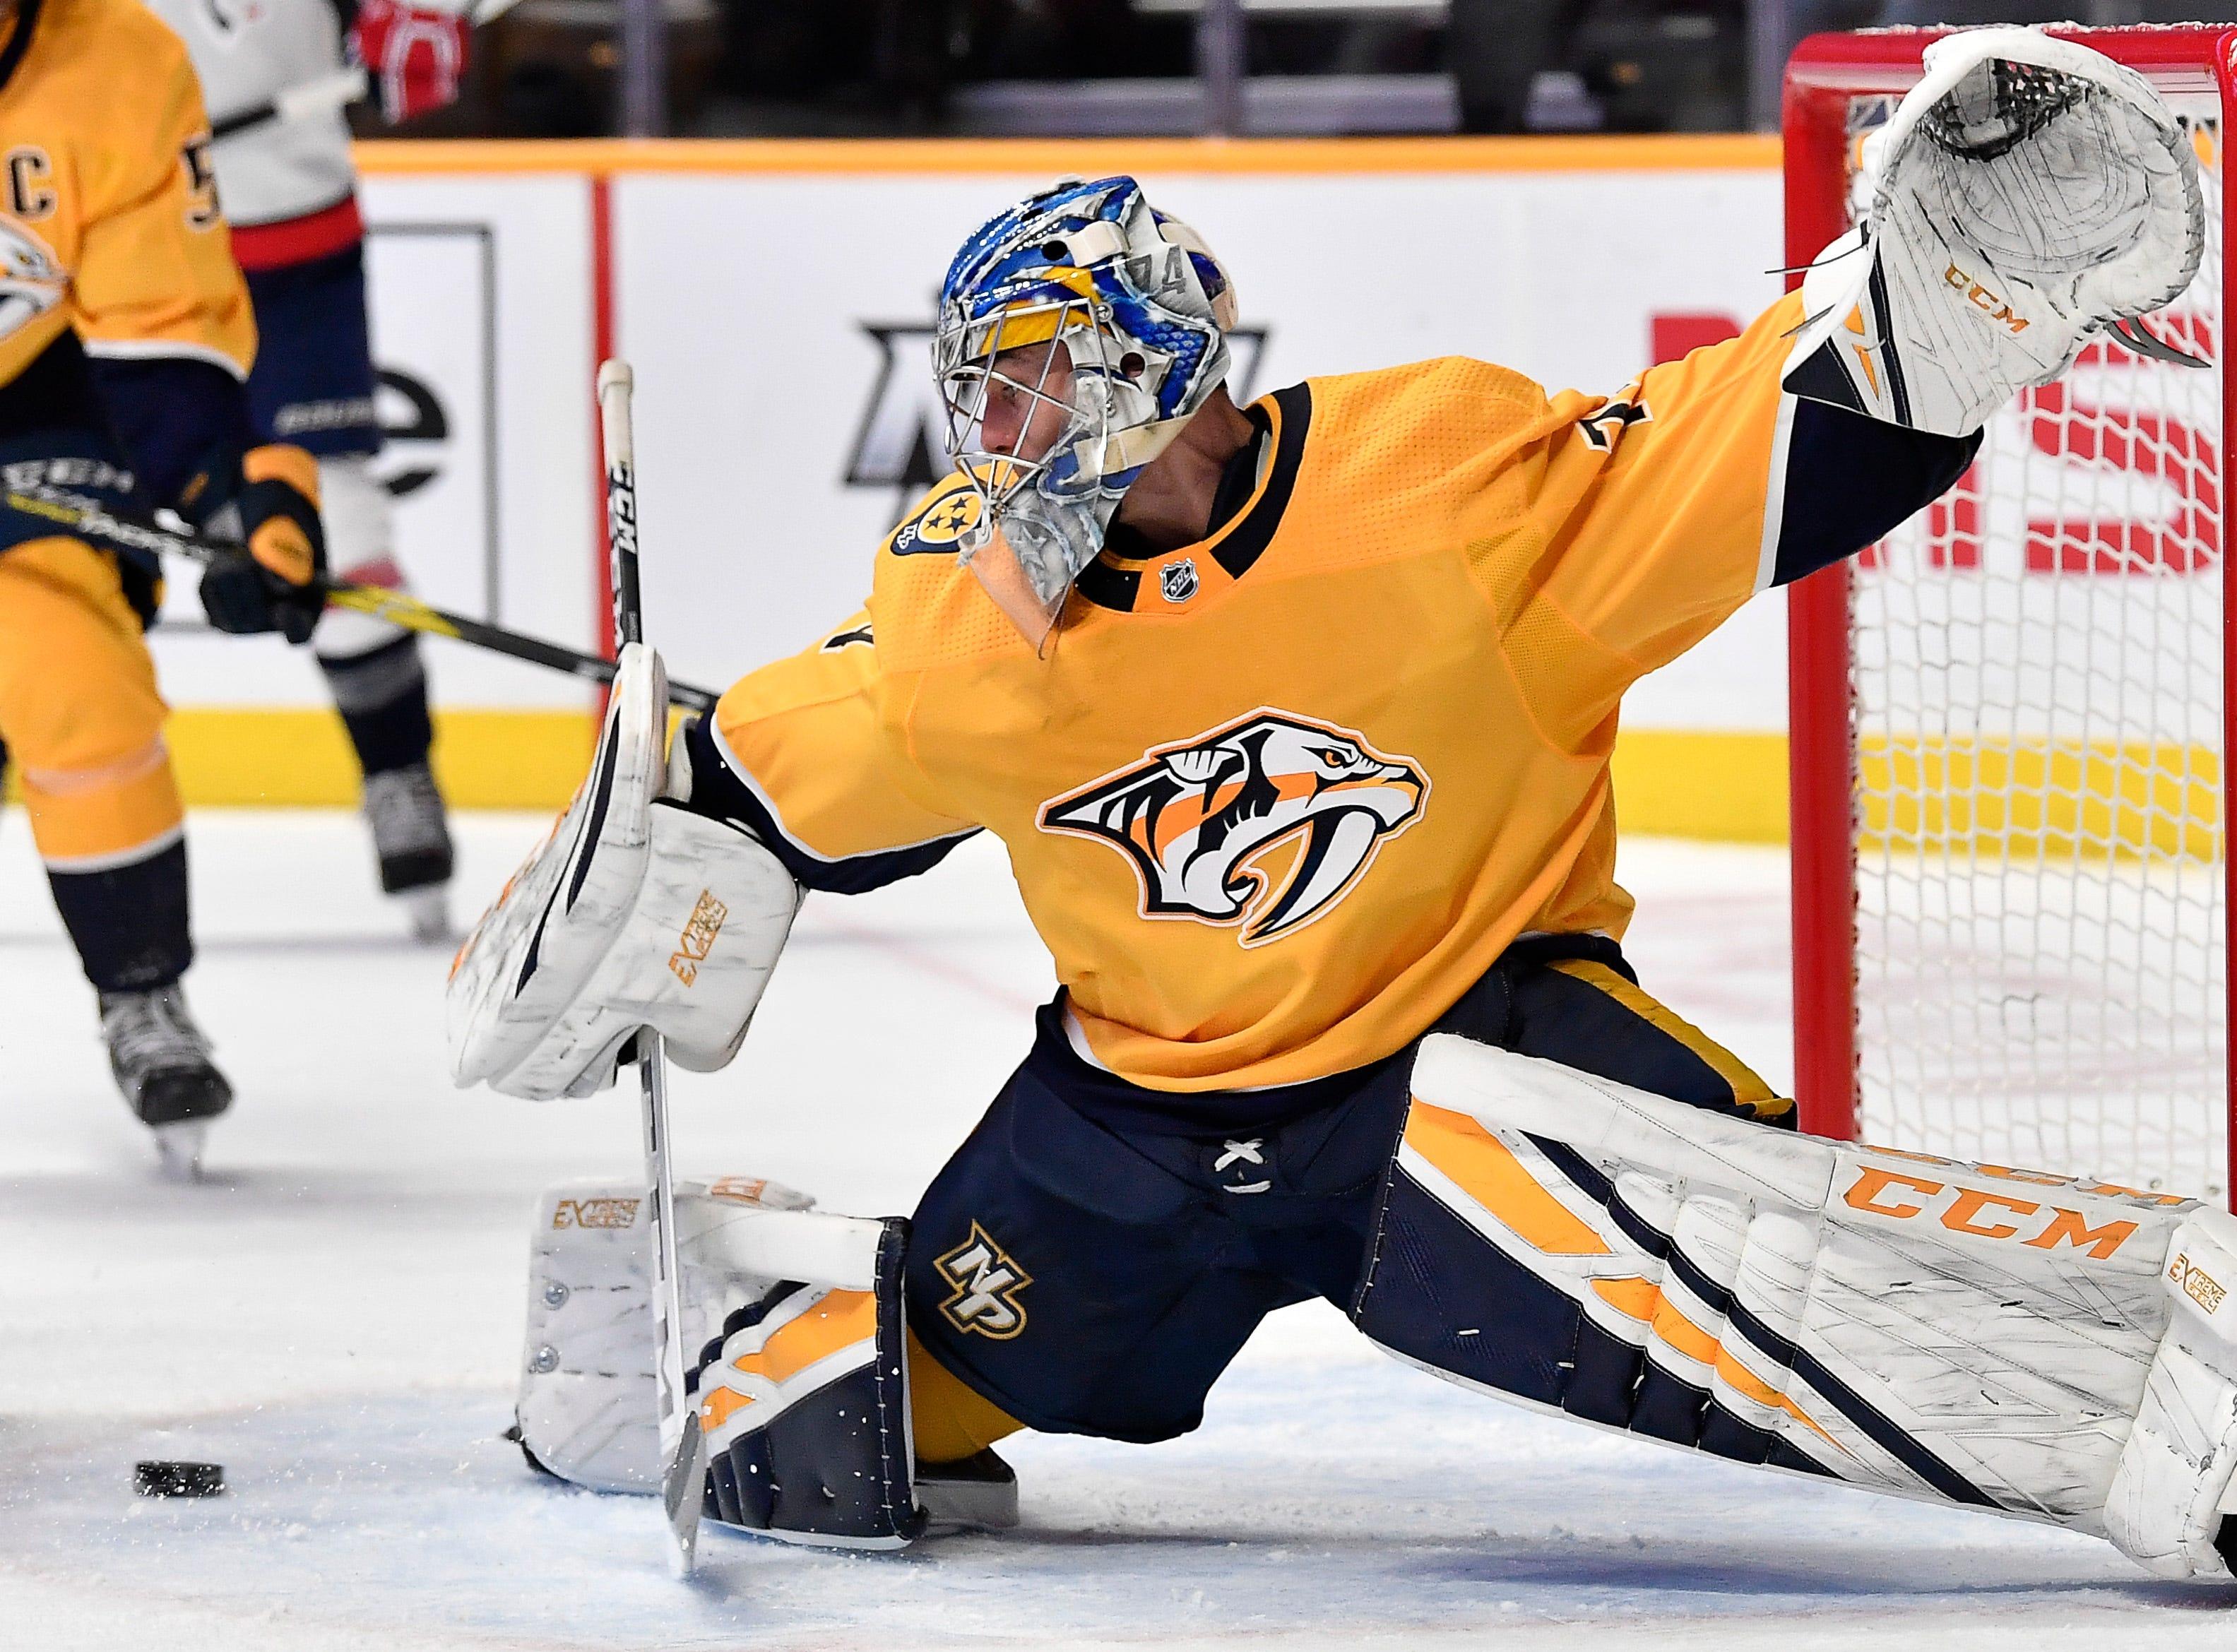 Predators goaltender Juuse Saros (74) blocks a Capitals shot on goal during the second period at Bridgestone Arena Tuesday, Jan. 15, 2019, in Nashville, Tenn.